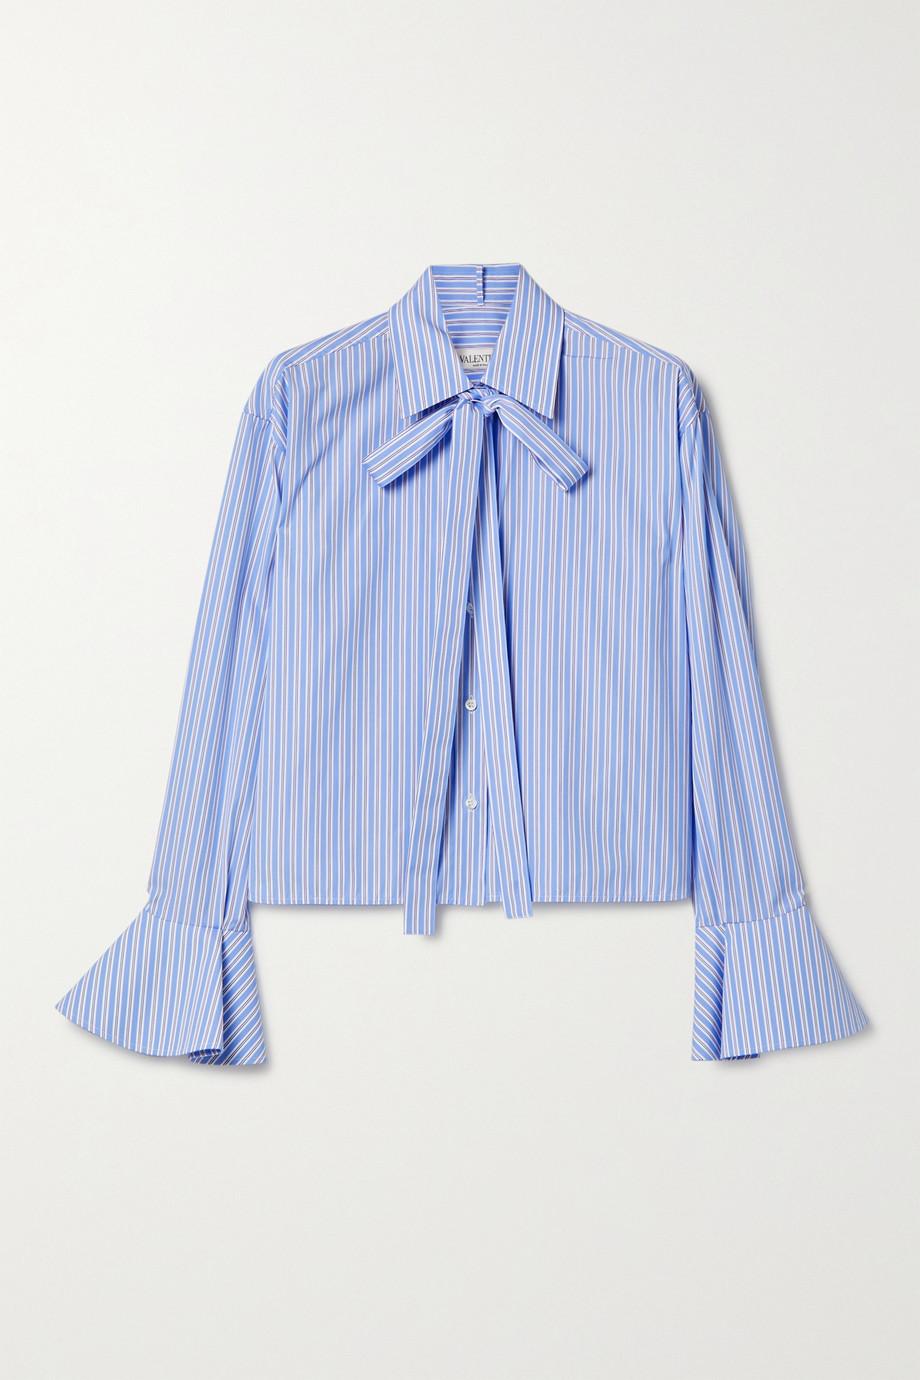 Valentino Tie-neck striped cotton-poplin shirt